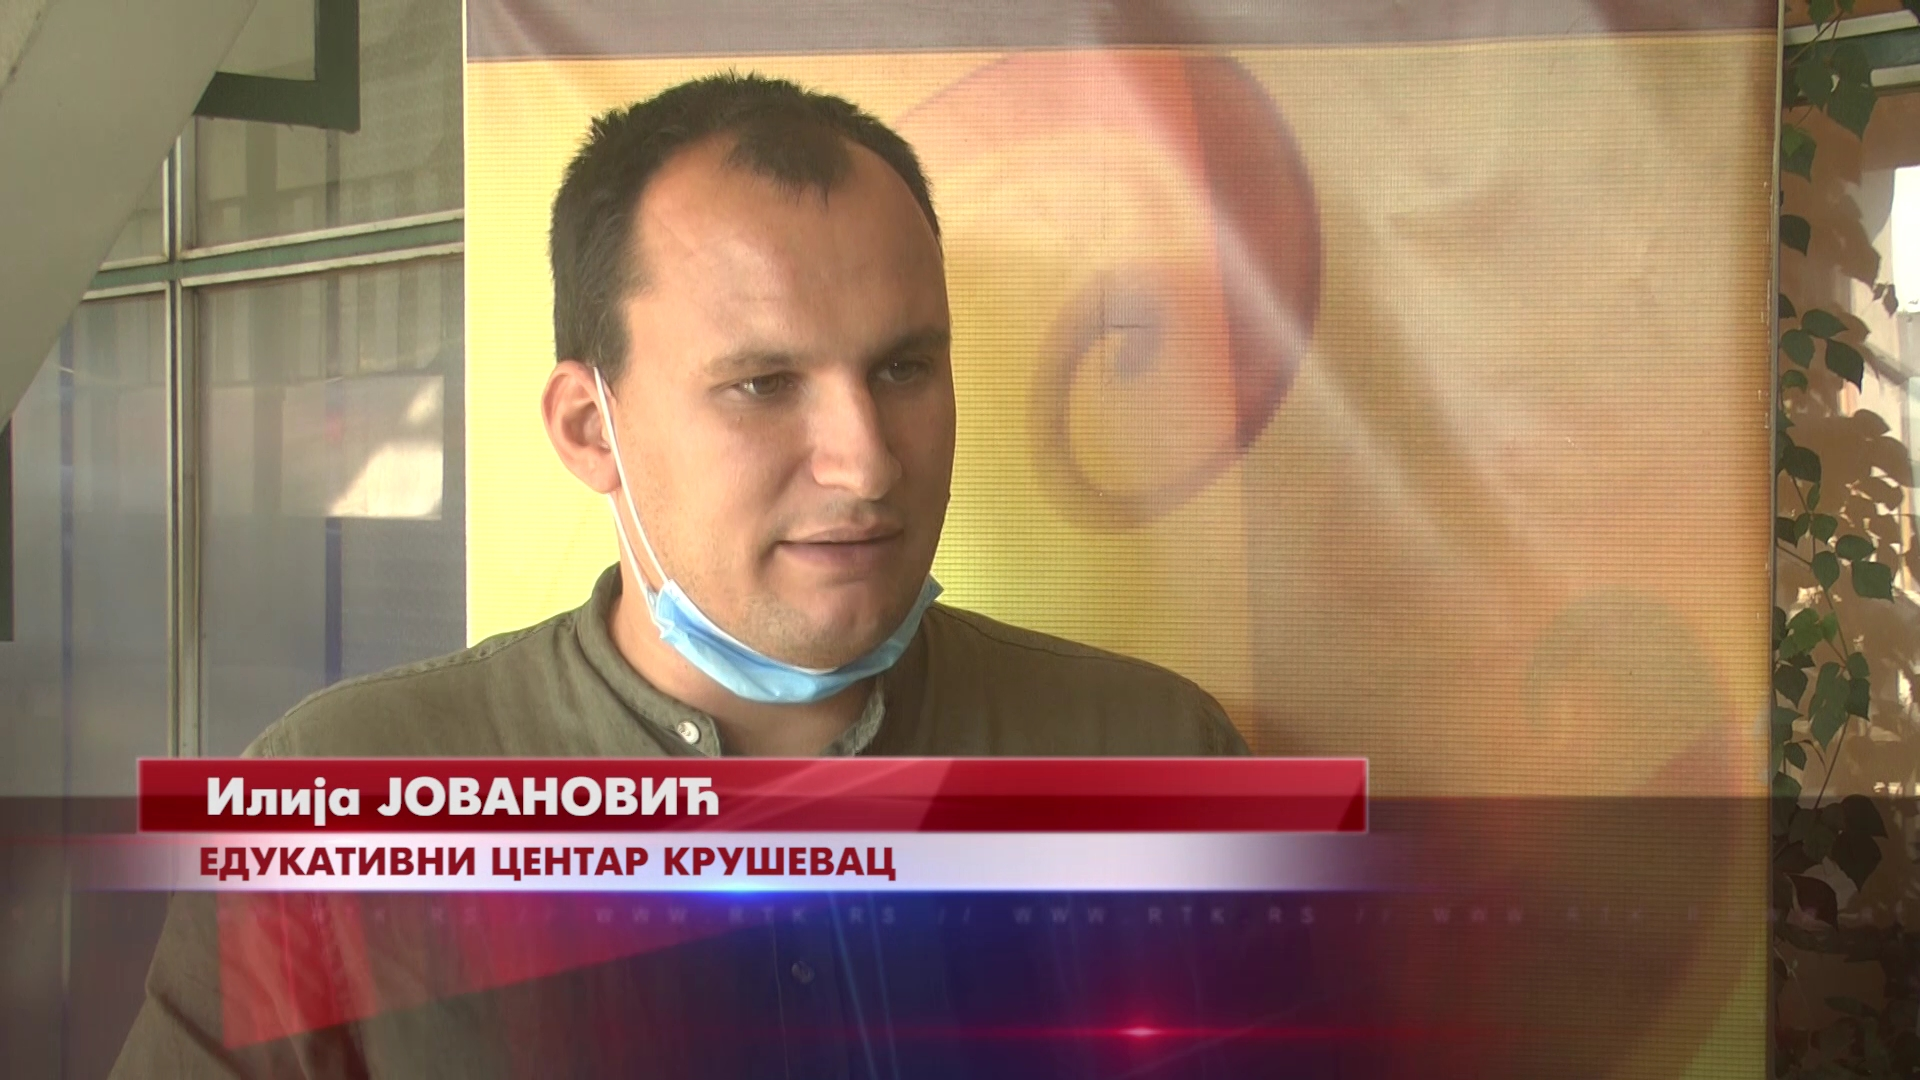 Edukativni centar Kruševac realizuje program ZNANJEM DO POSLA